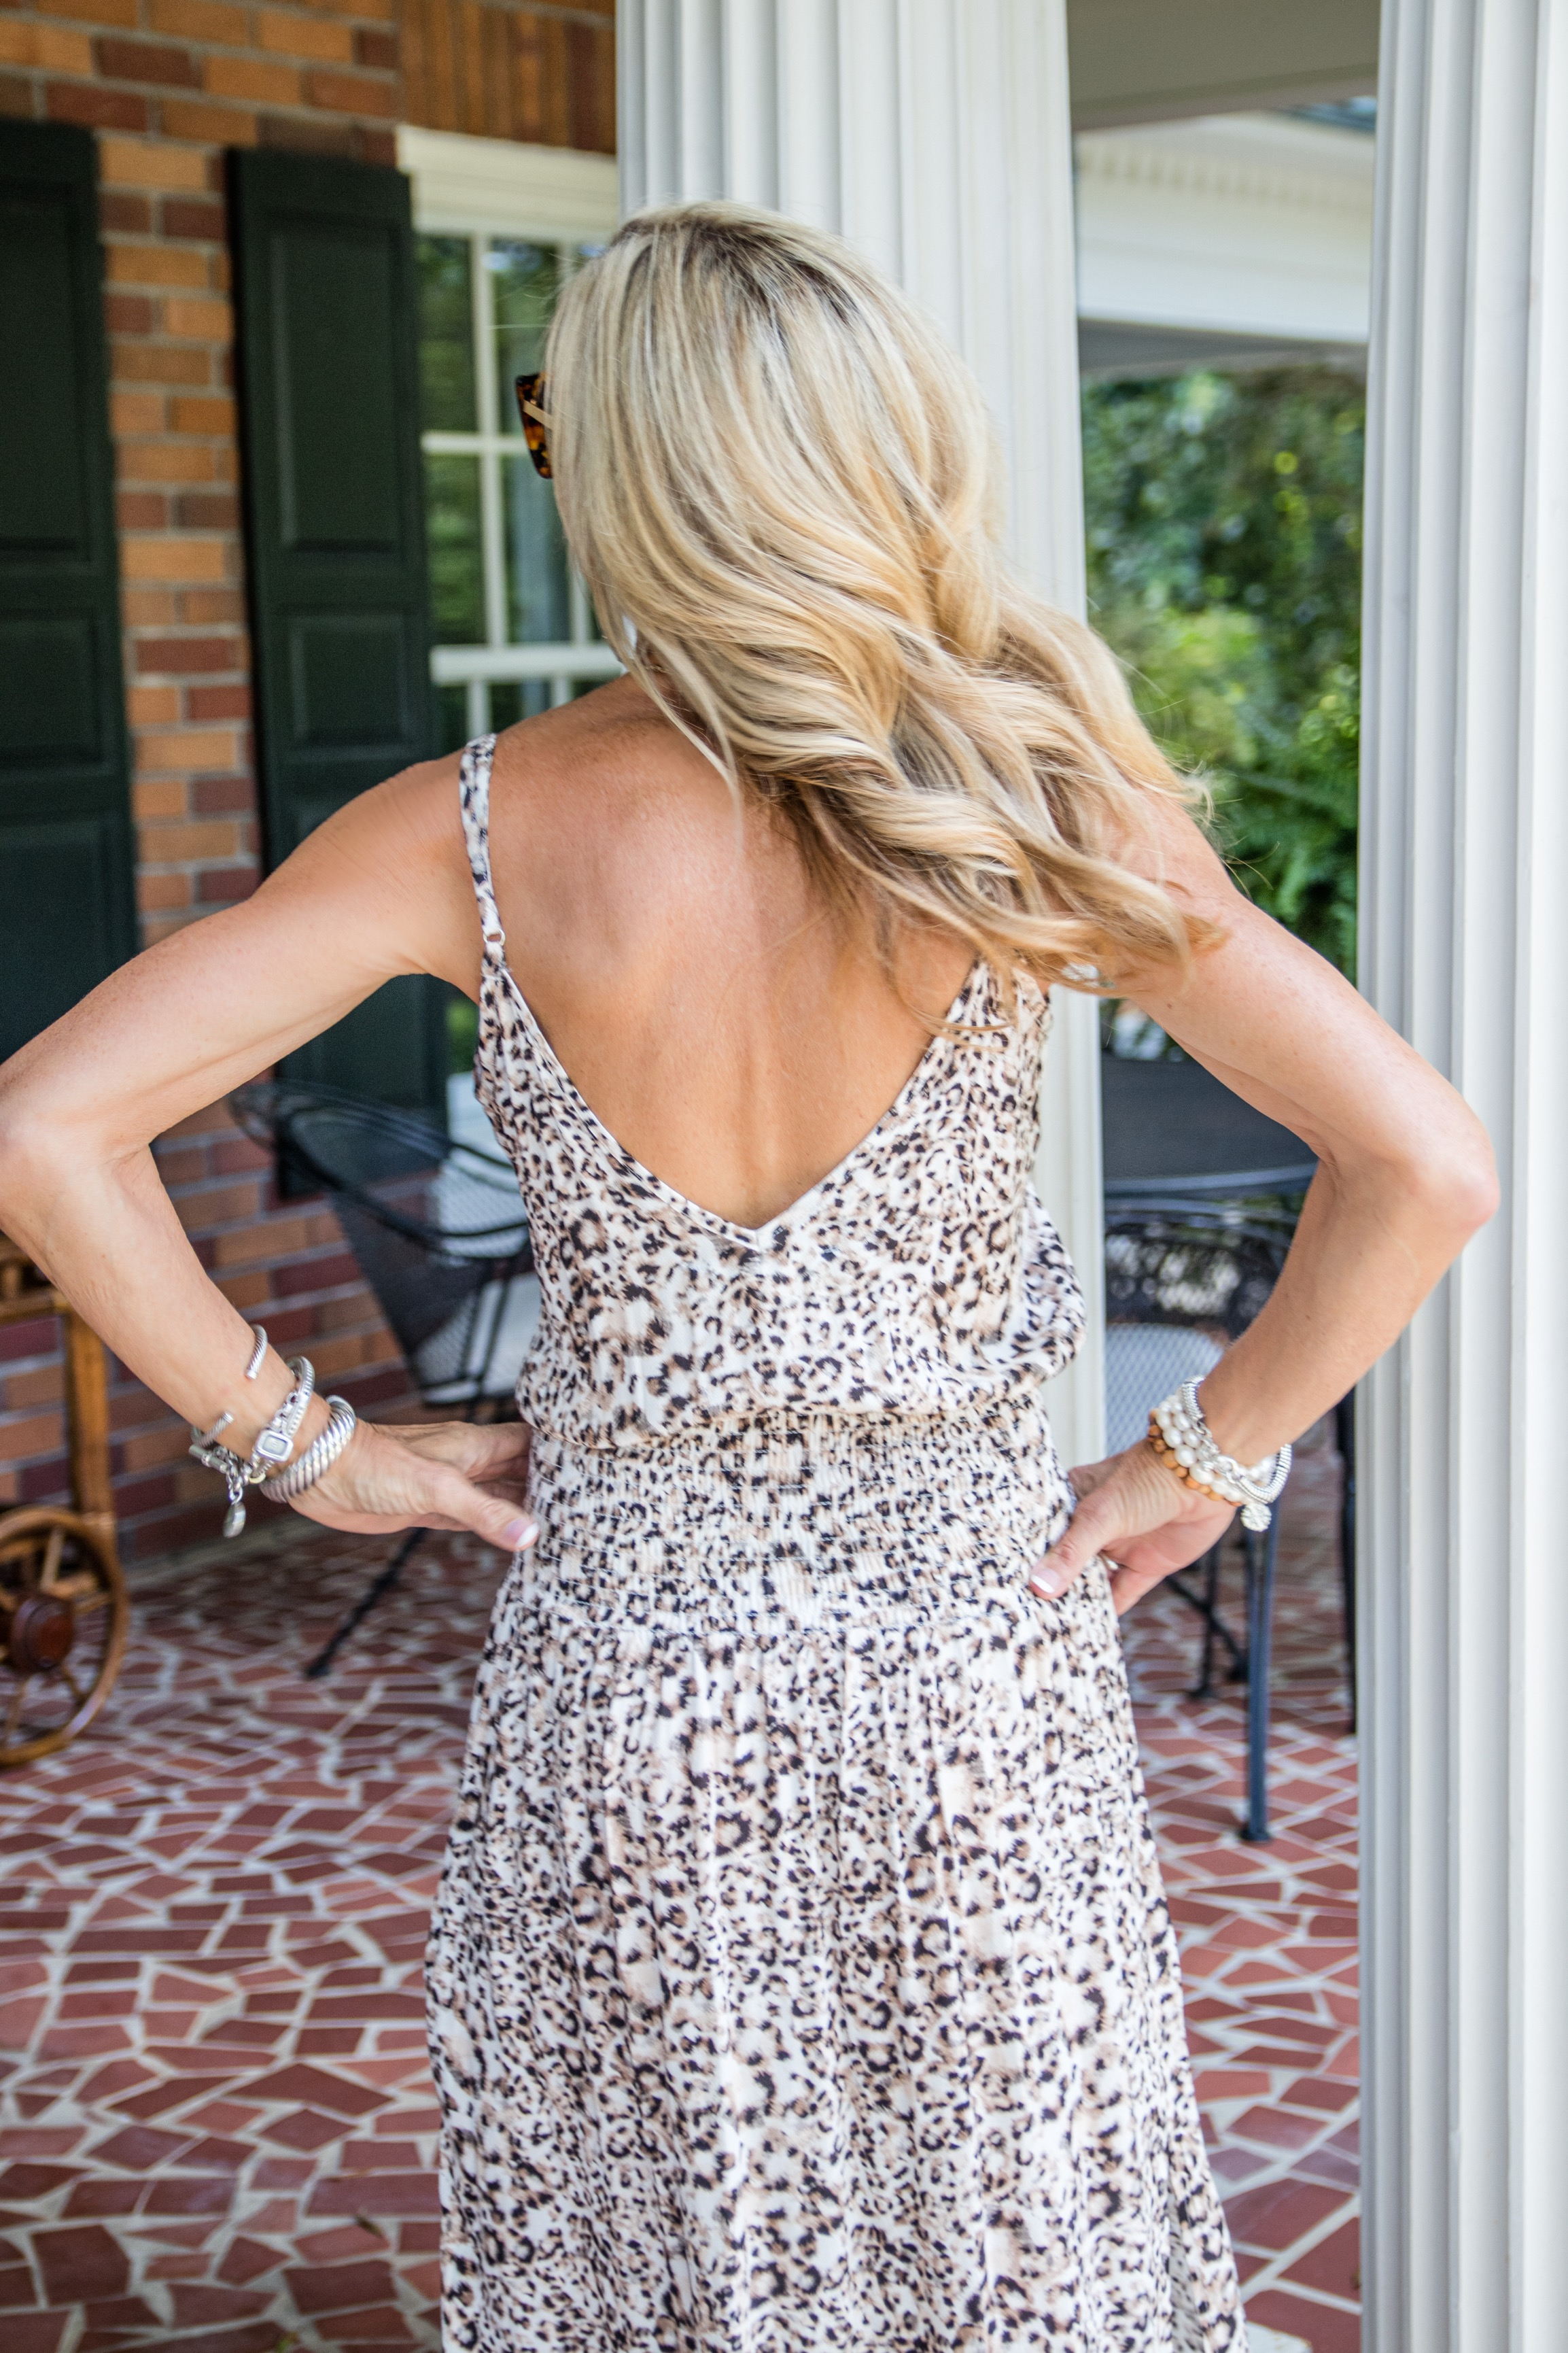 Blue Life leopard print dress - Crazy Blonde Style